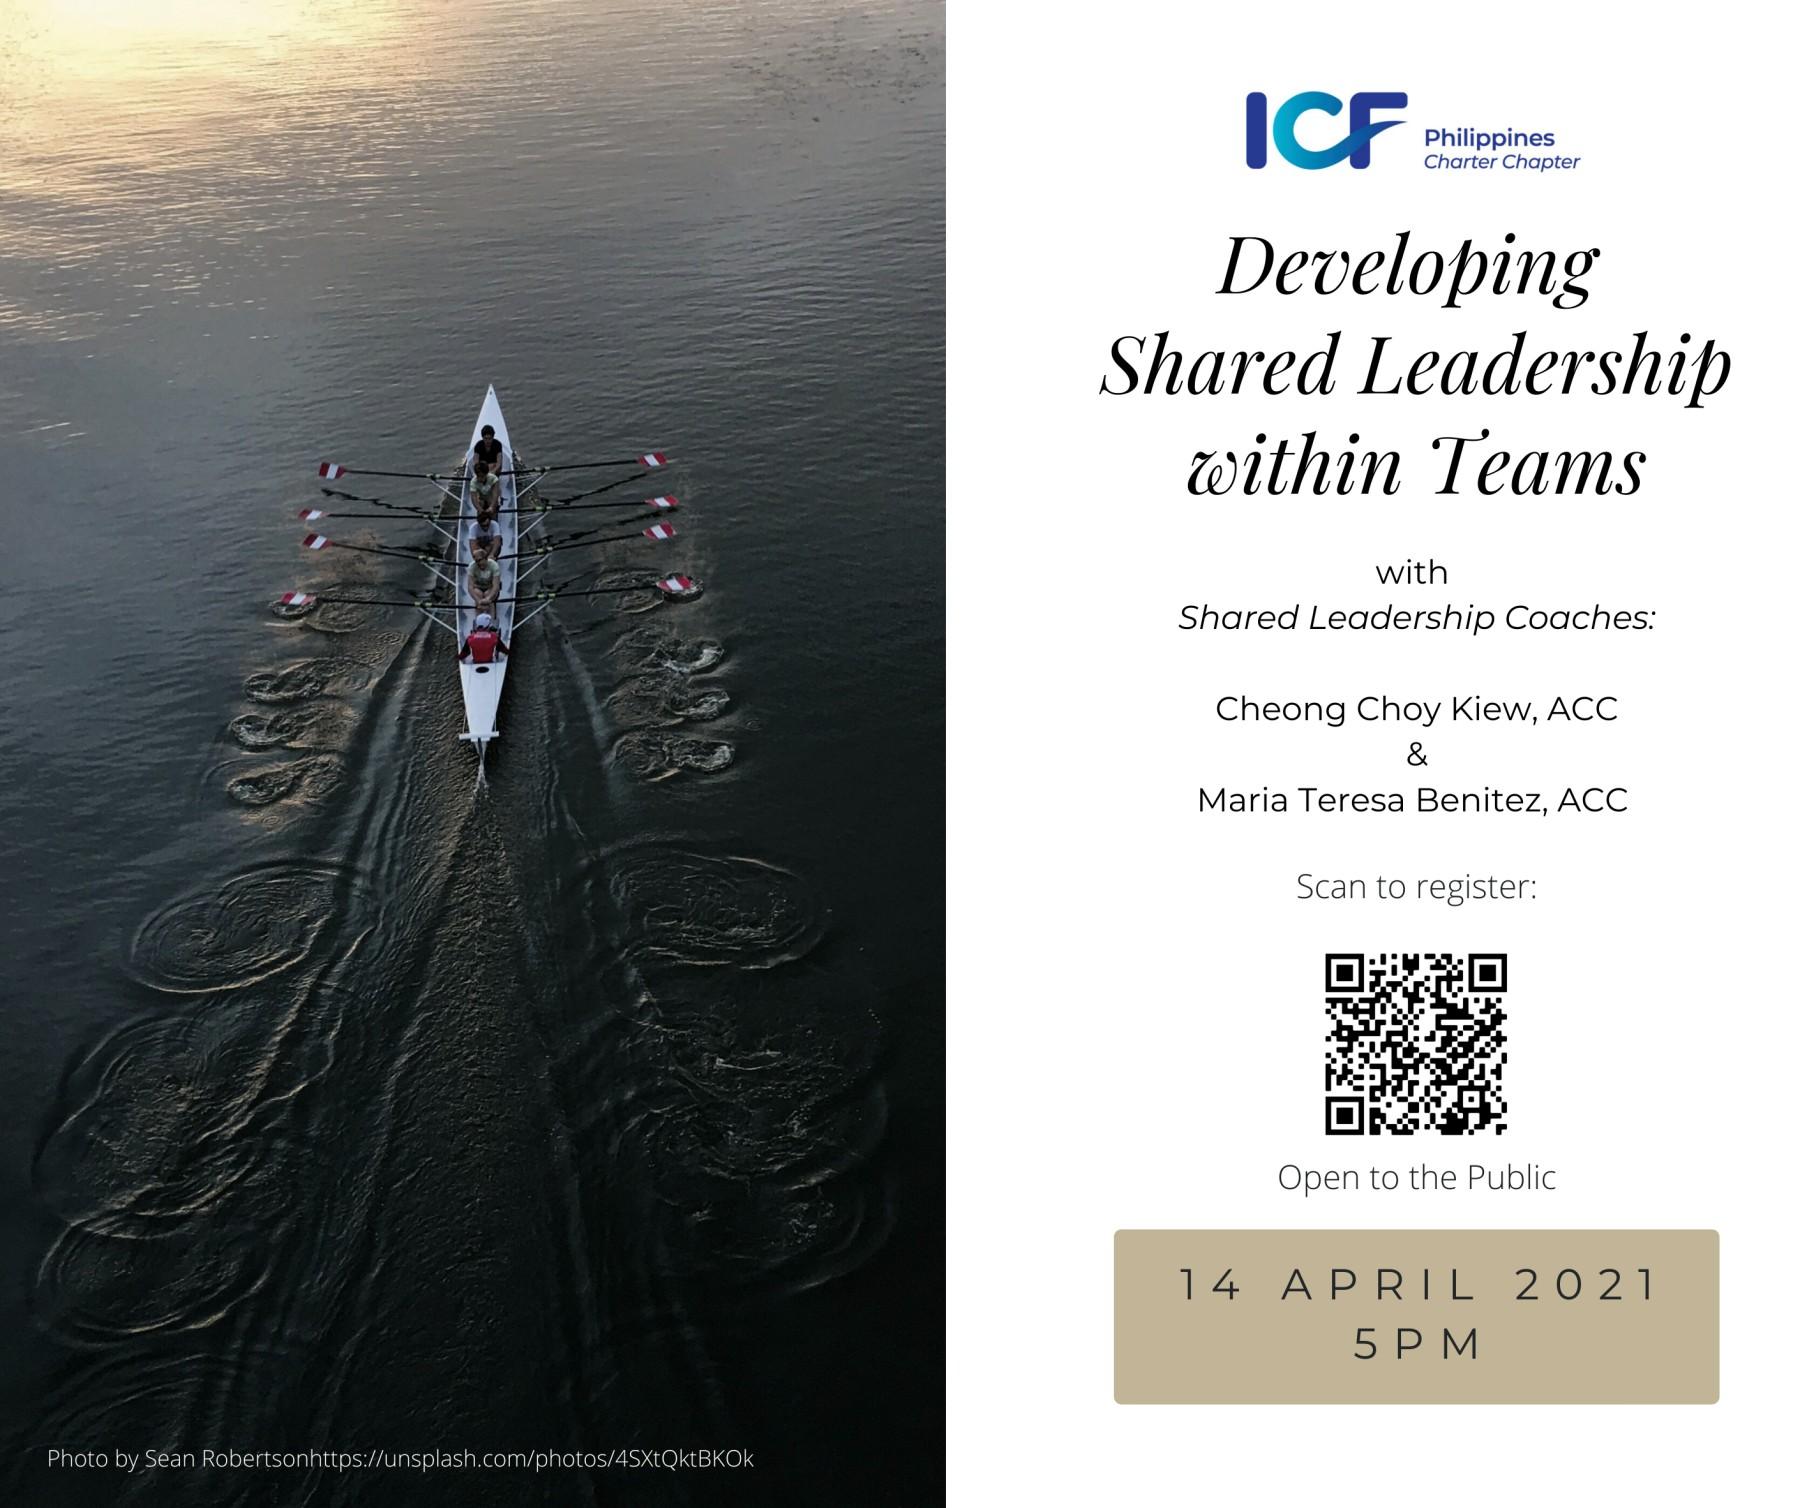 Developing Shared Leadership